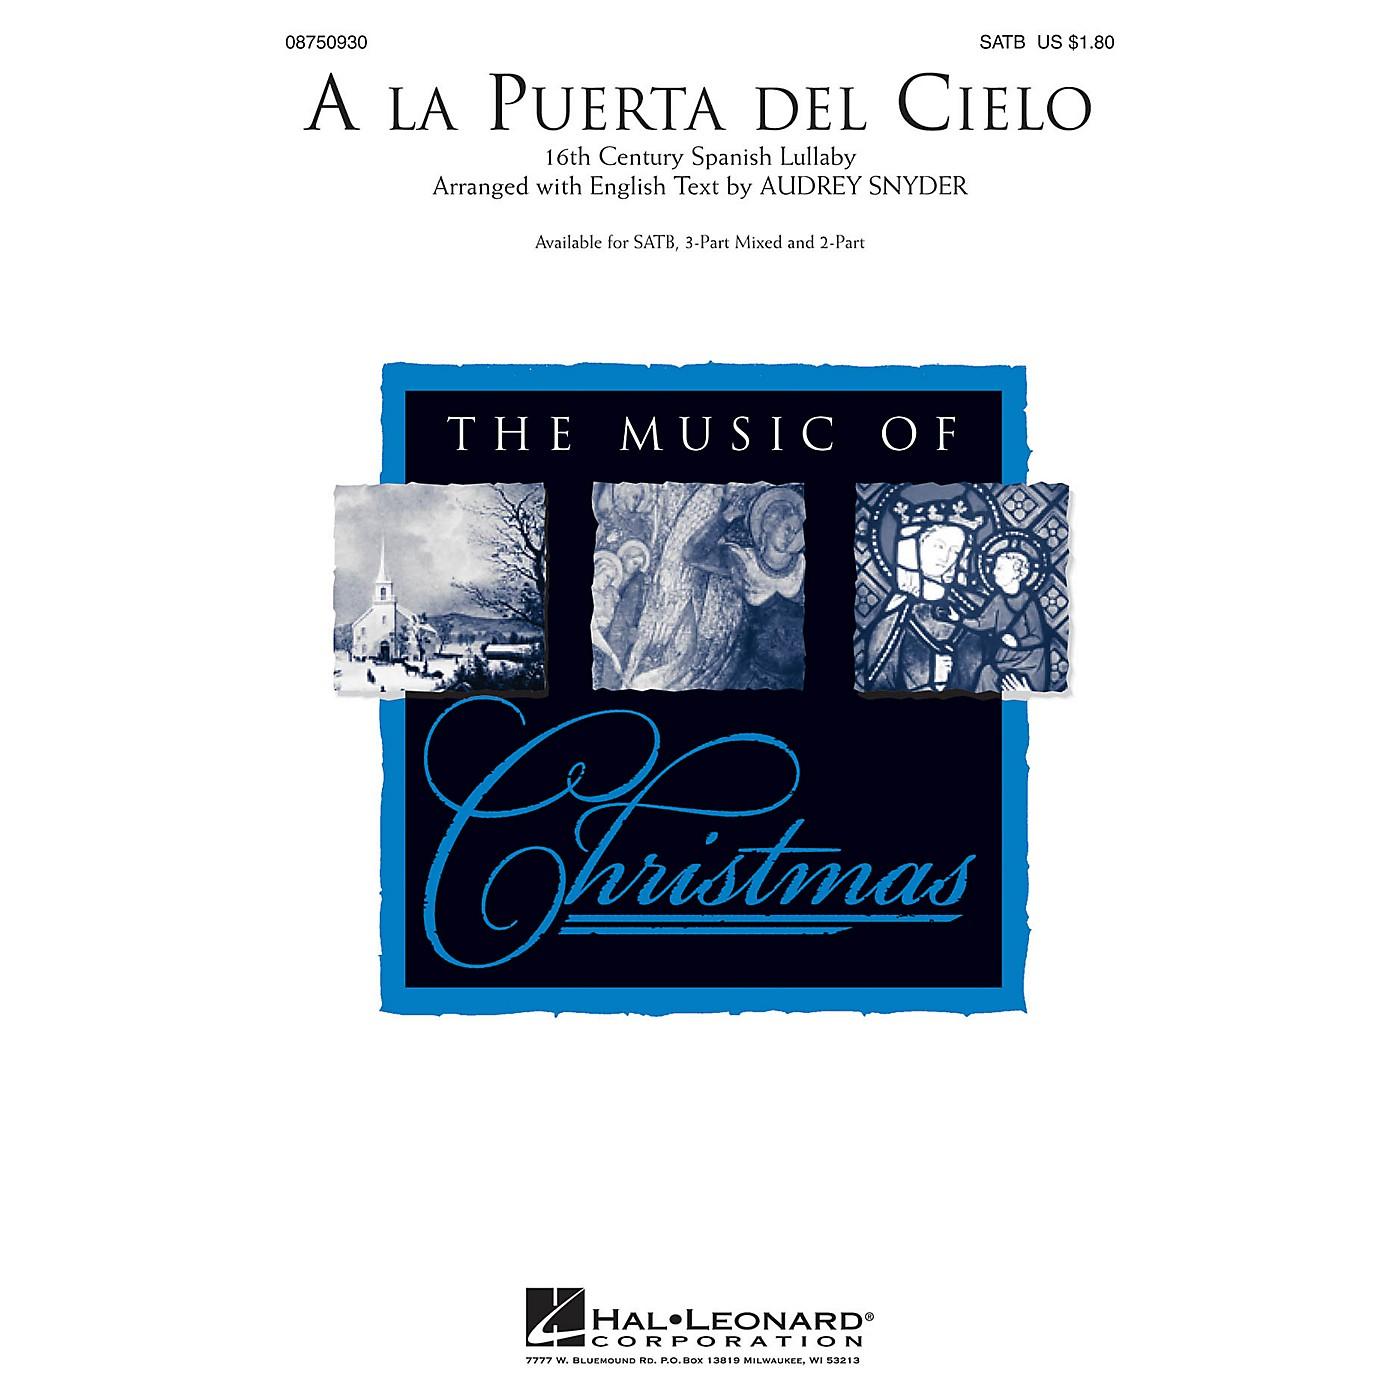 Hal Leonard A la Puerta del Cielo 2-Part Arranged by Audrey Snyder thumbnail